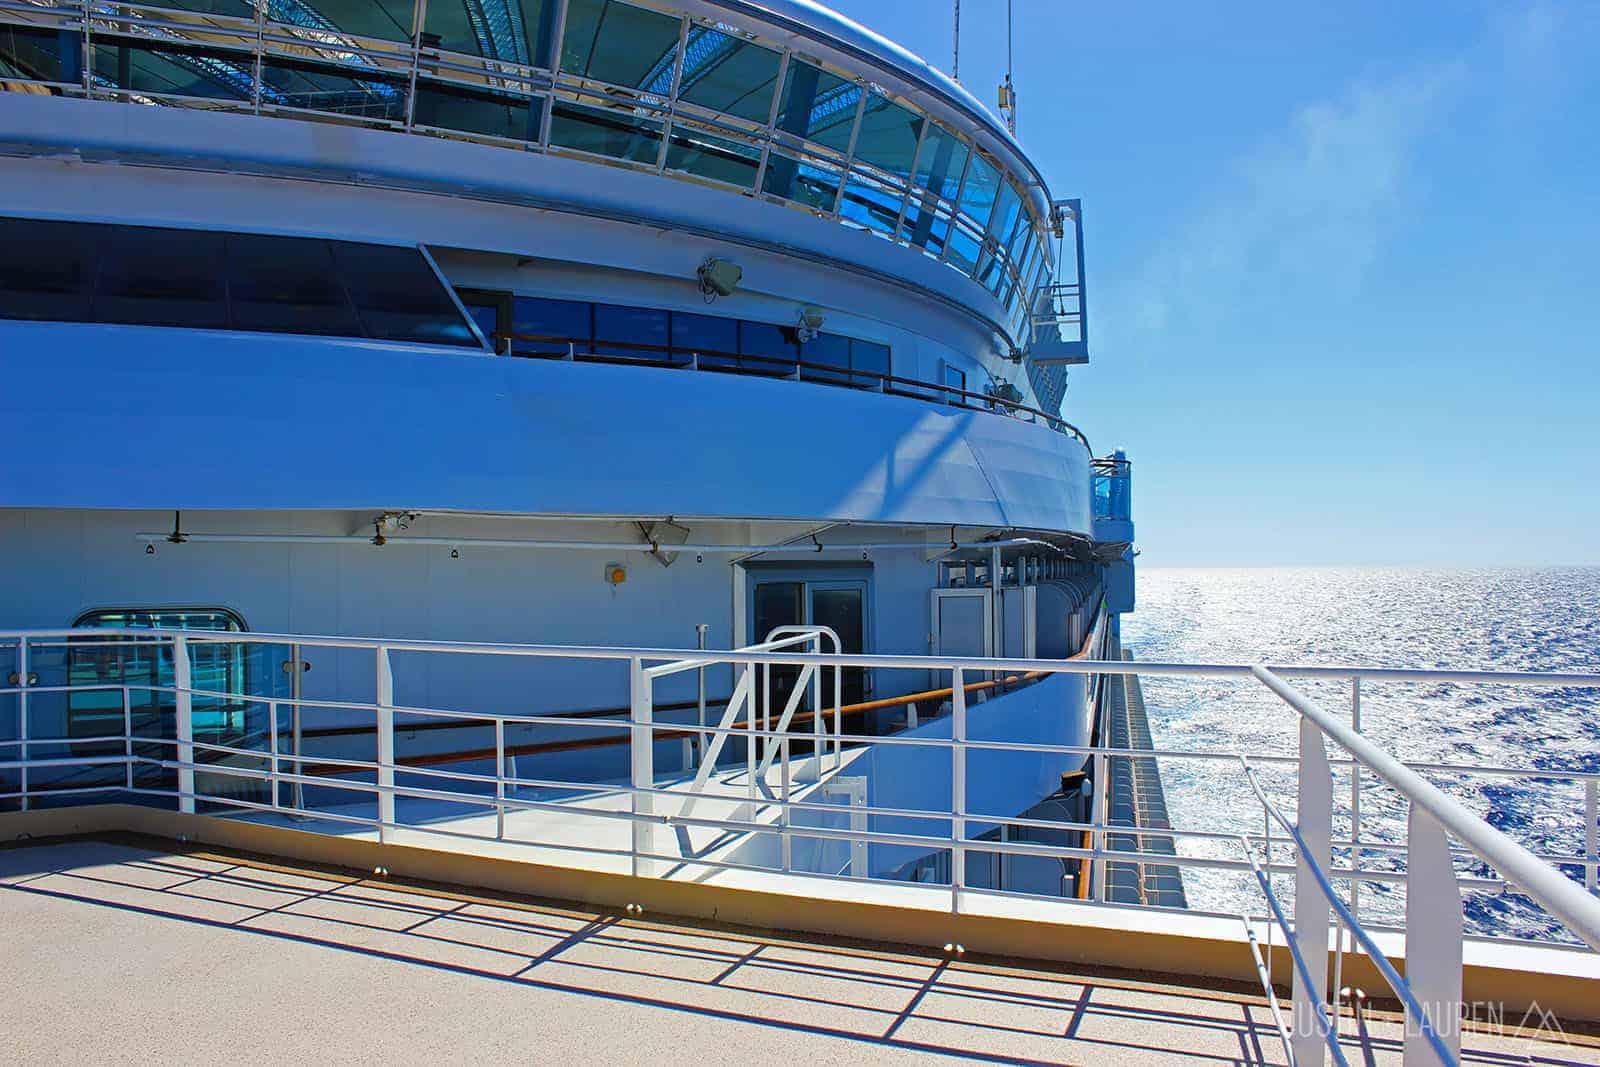 Caribbean Princess Cruise Ship Photo Tour